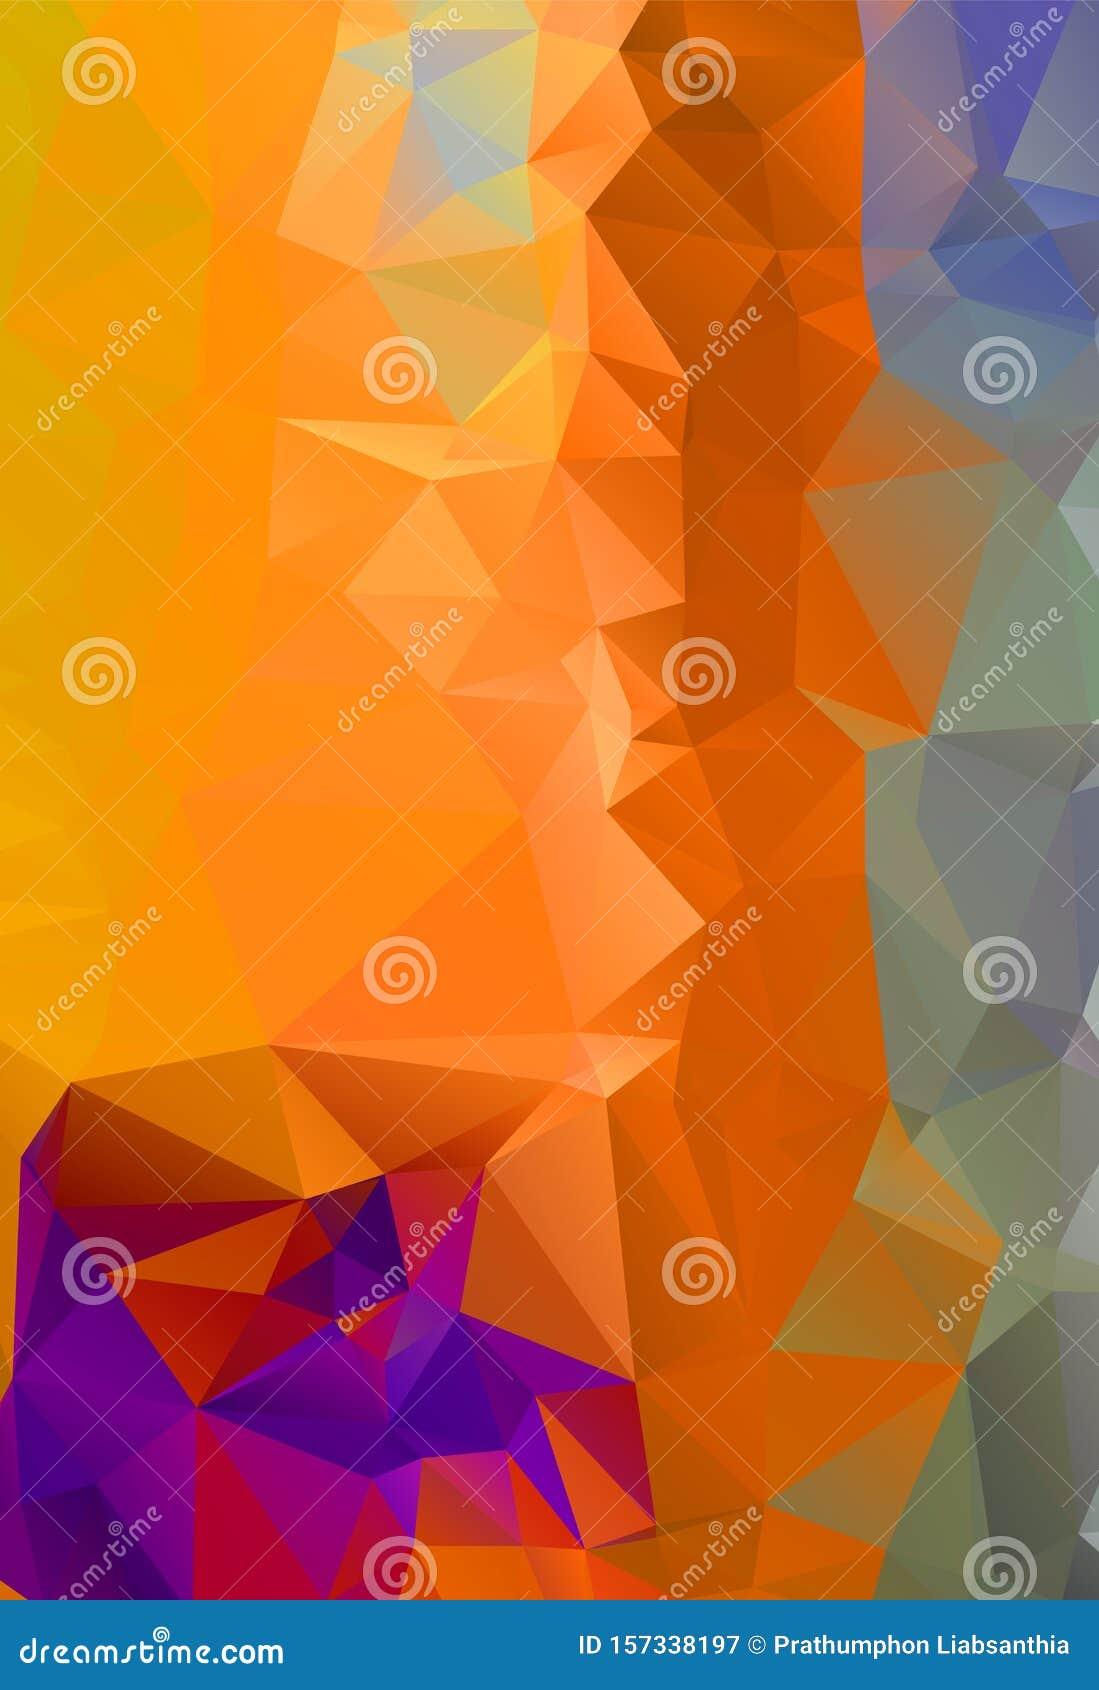 Abstract multicolor orange son background. Vector polygonal design illustrator